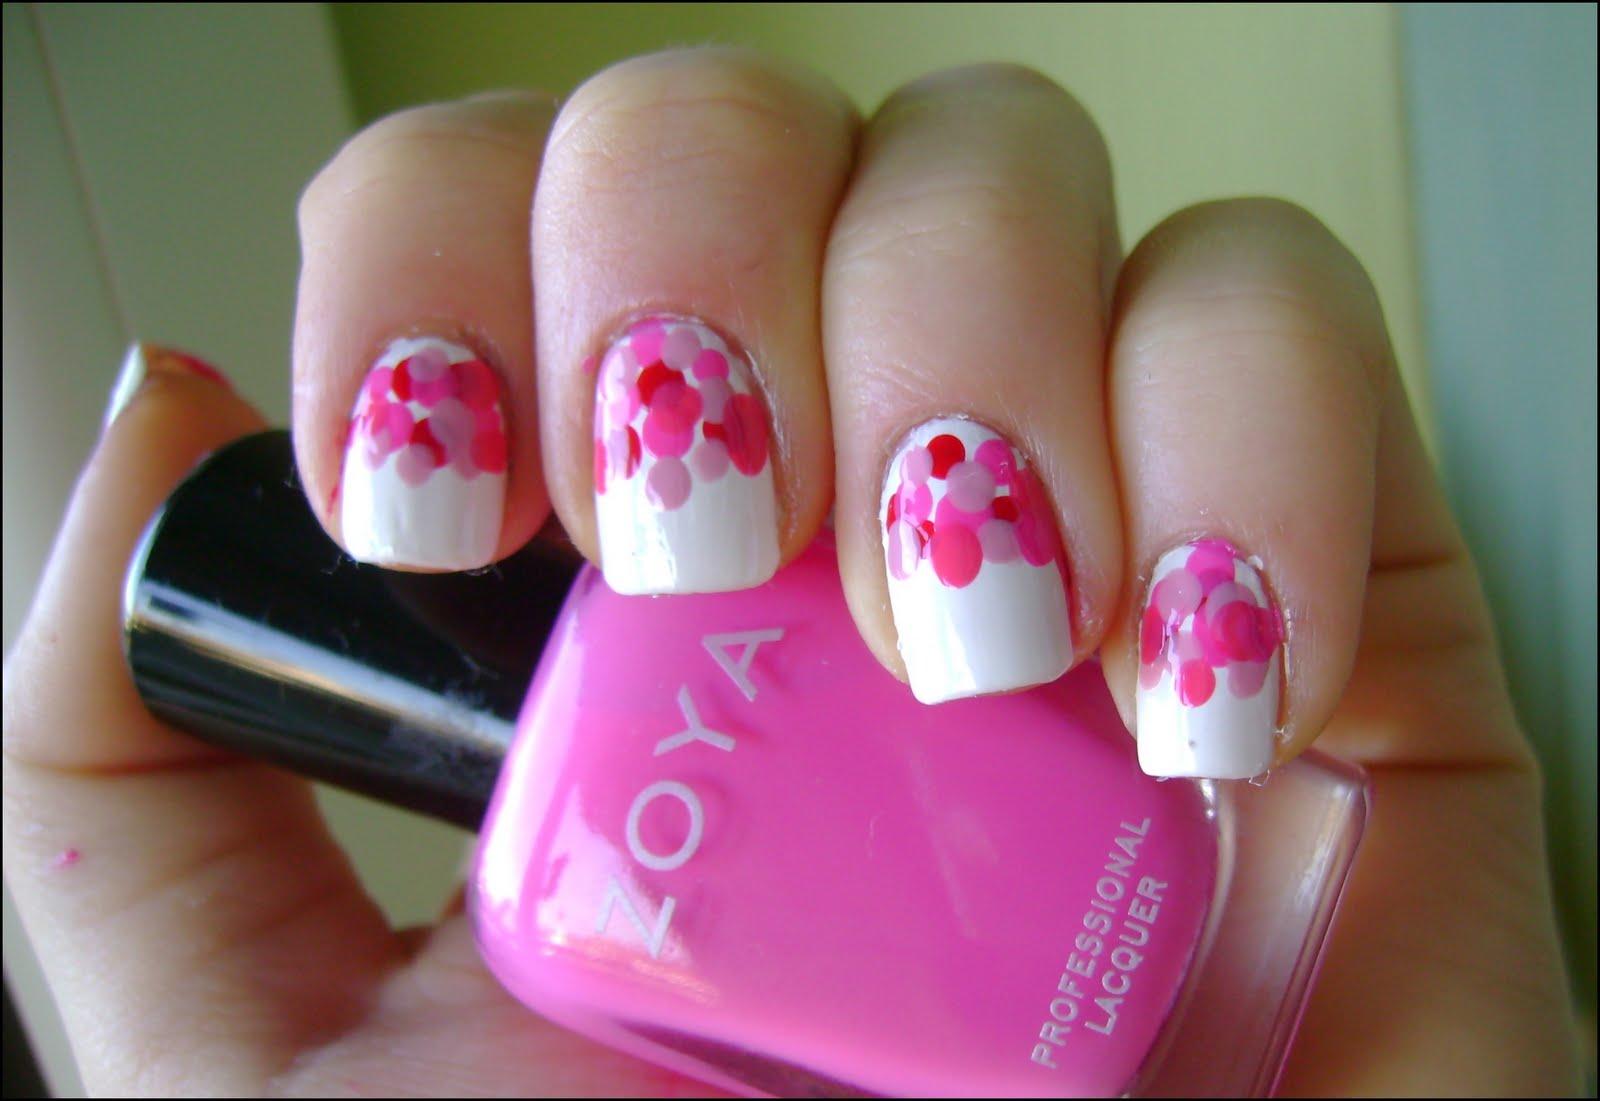 Acrylic Nail Art Designs Pink Dots Valentine S Day Manicure Idea